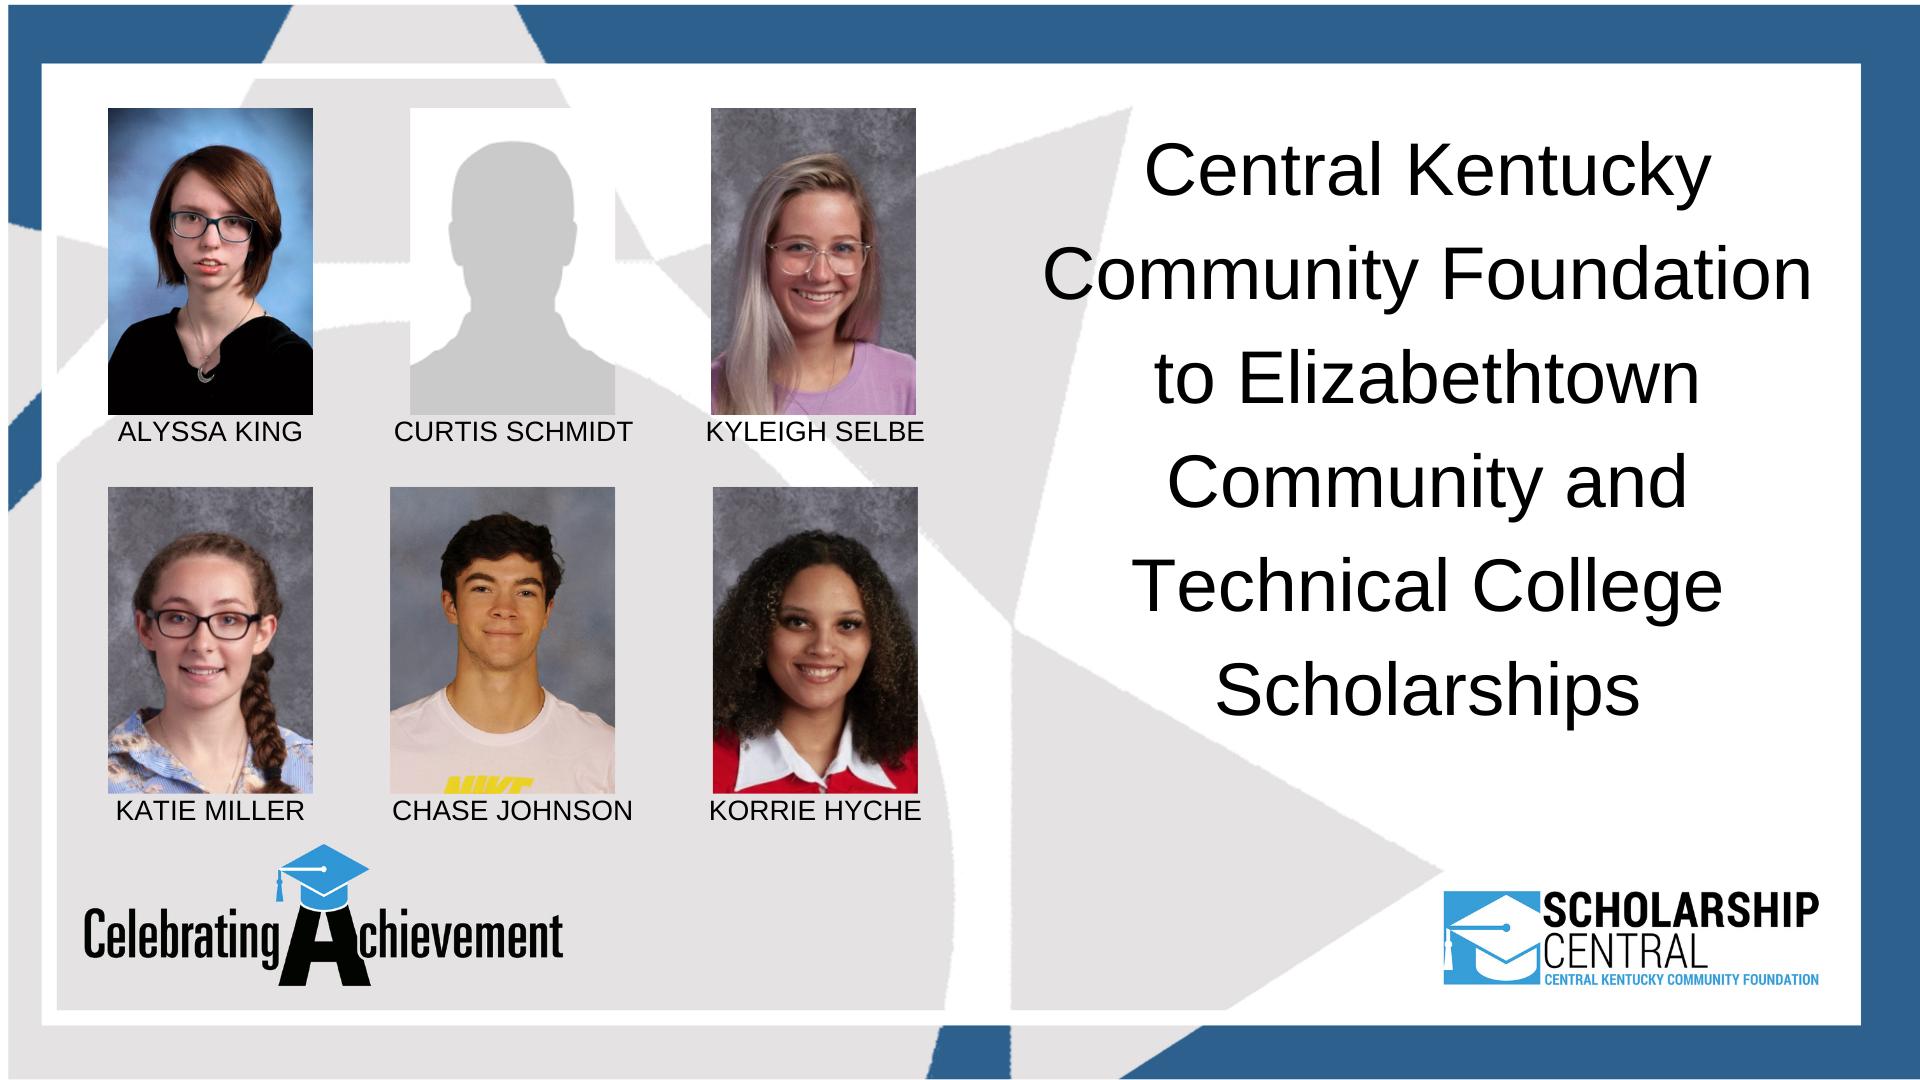 CKCF to ECTC Scholarship Winners 3